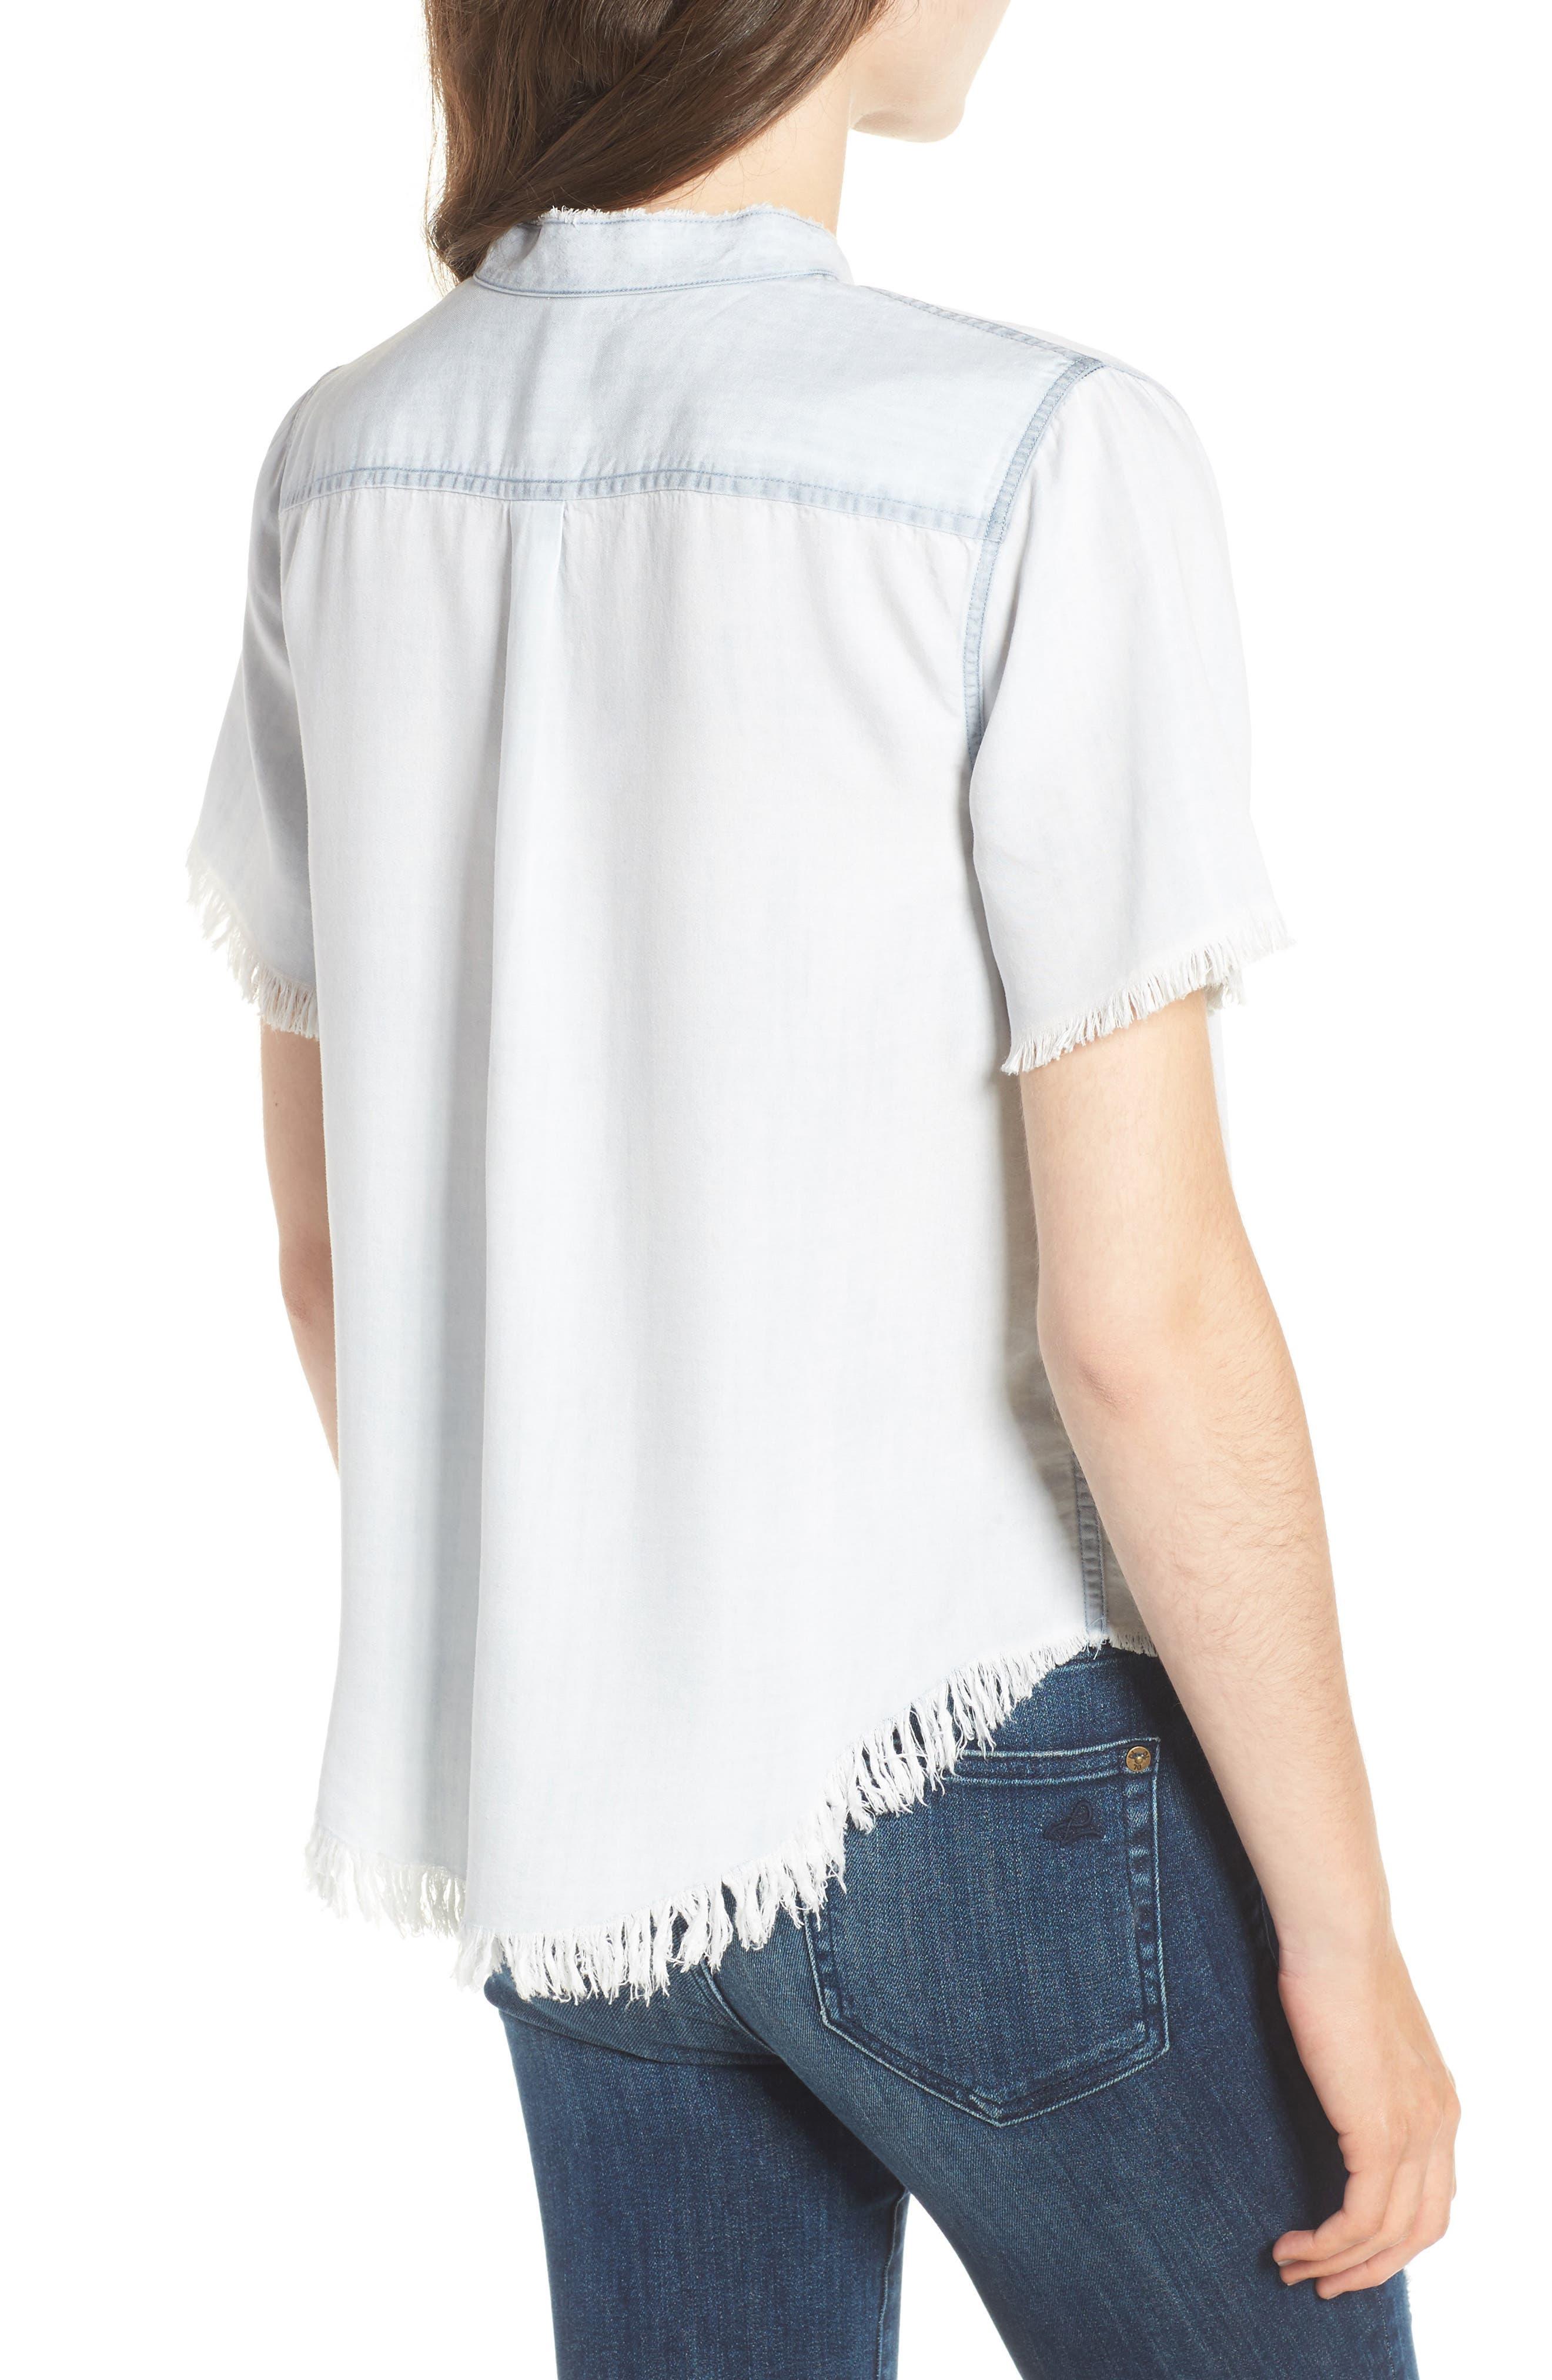 Montauk Shirt,                             Alternate thumbnail 4, color,